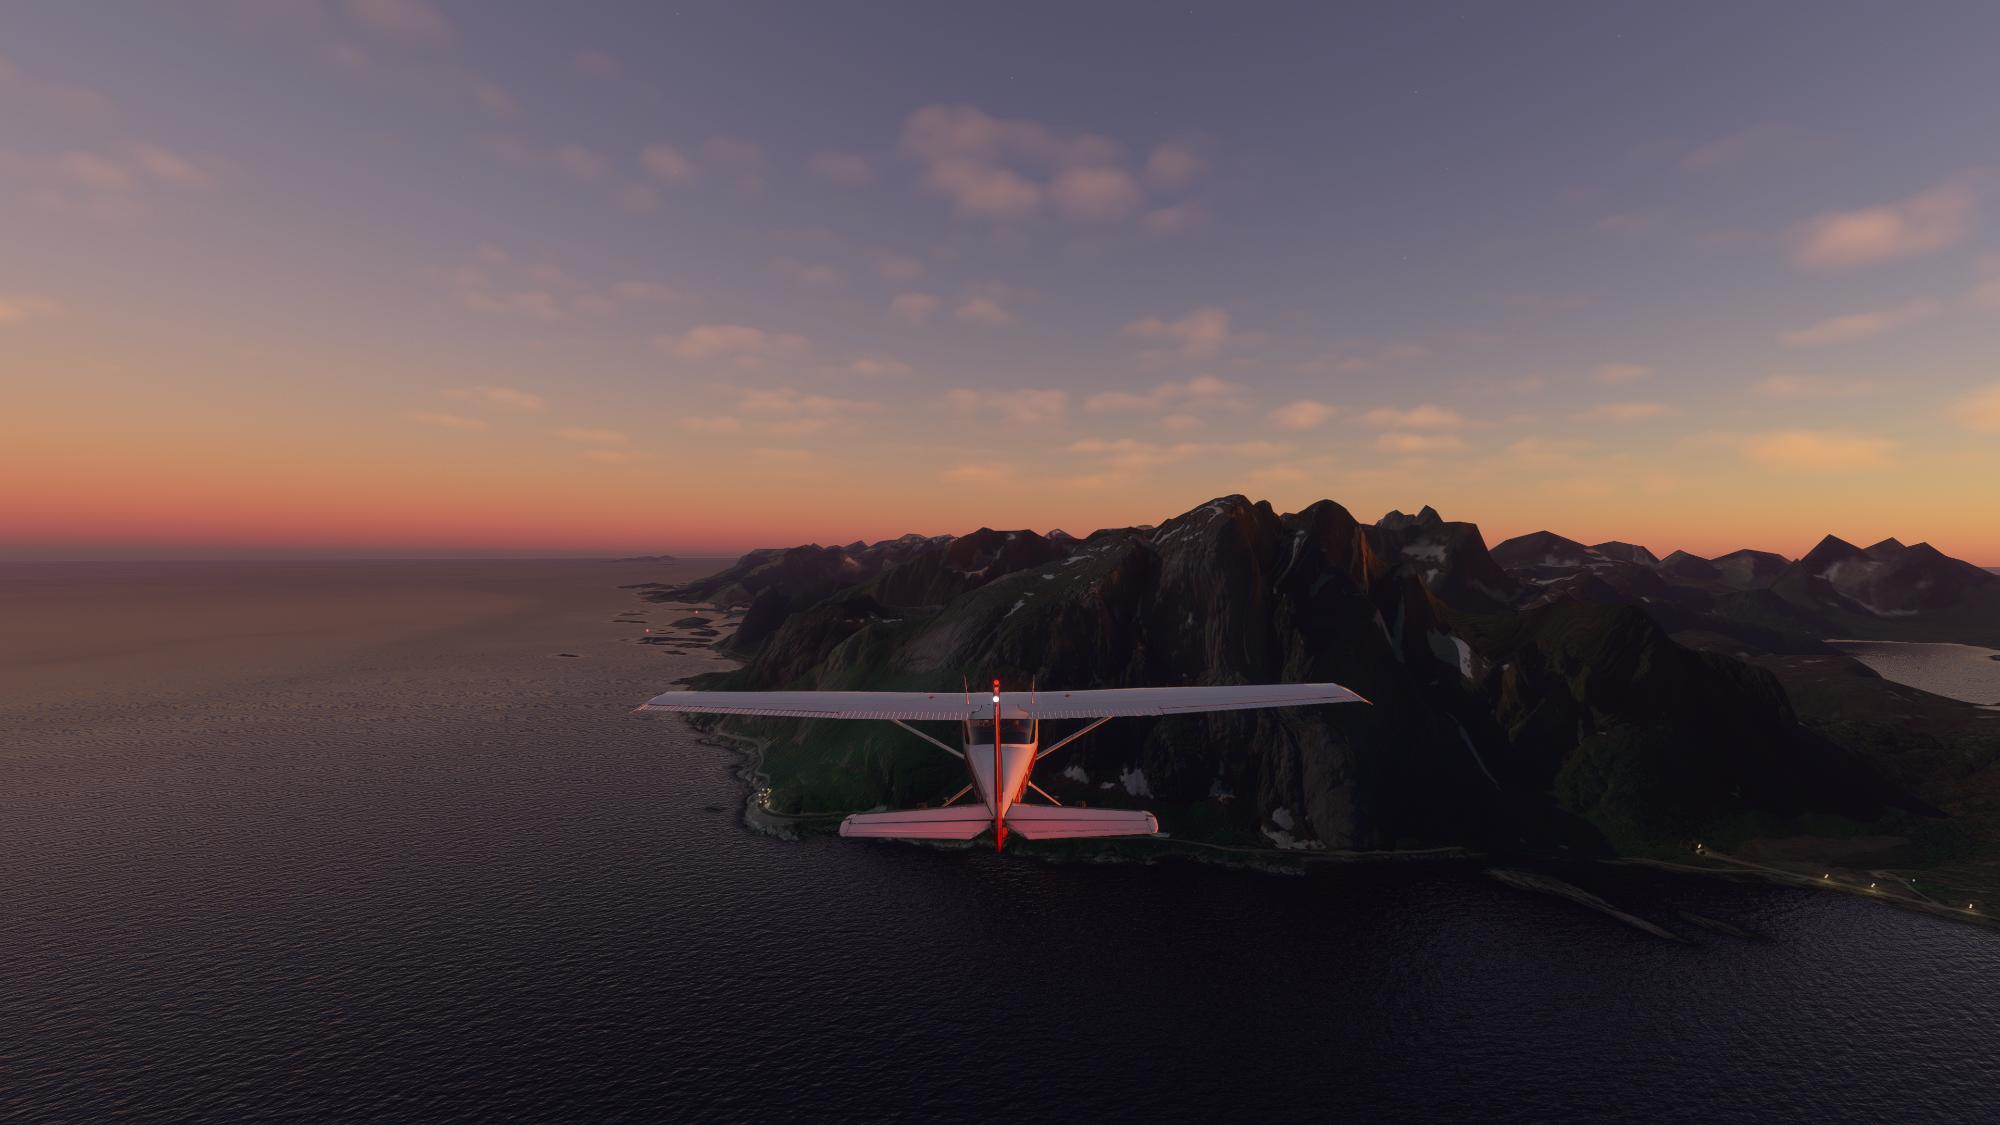 Microsoft Flight Simulator - 1.16.2.0 26.05.2021 00_02_51.png